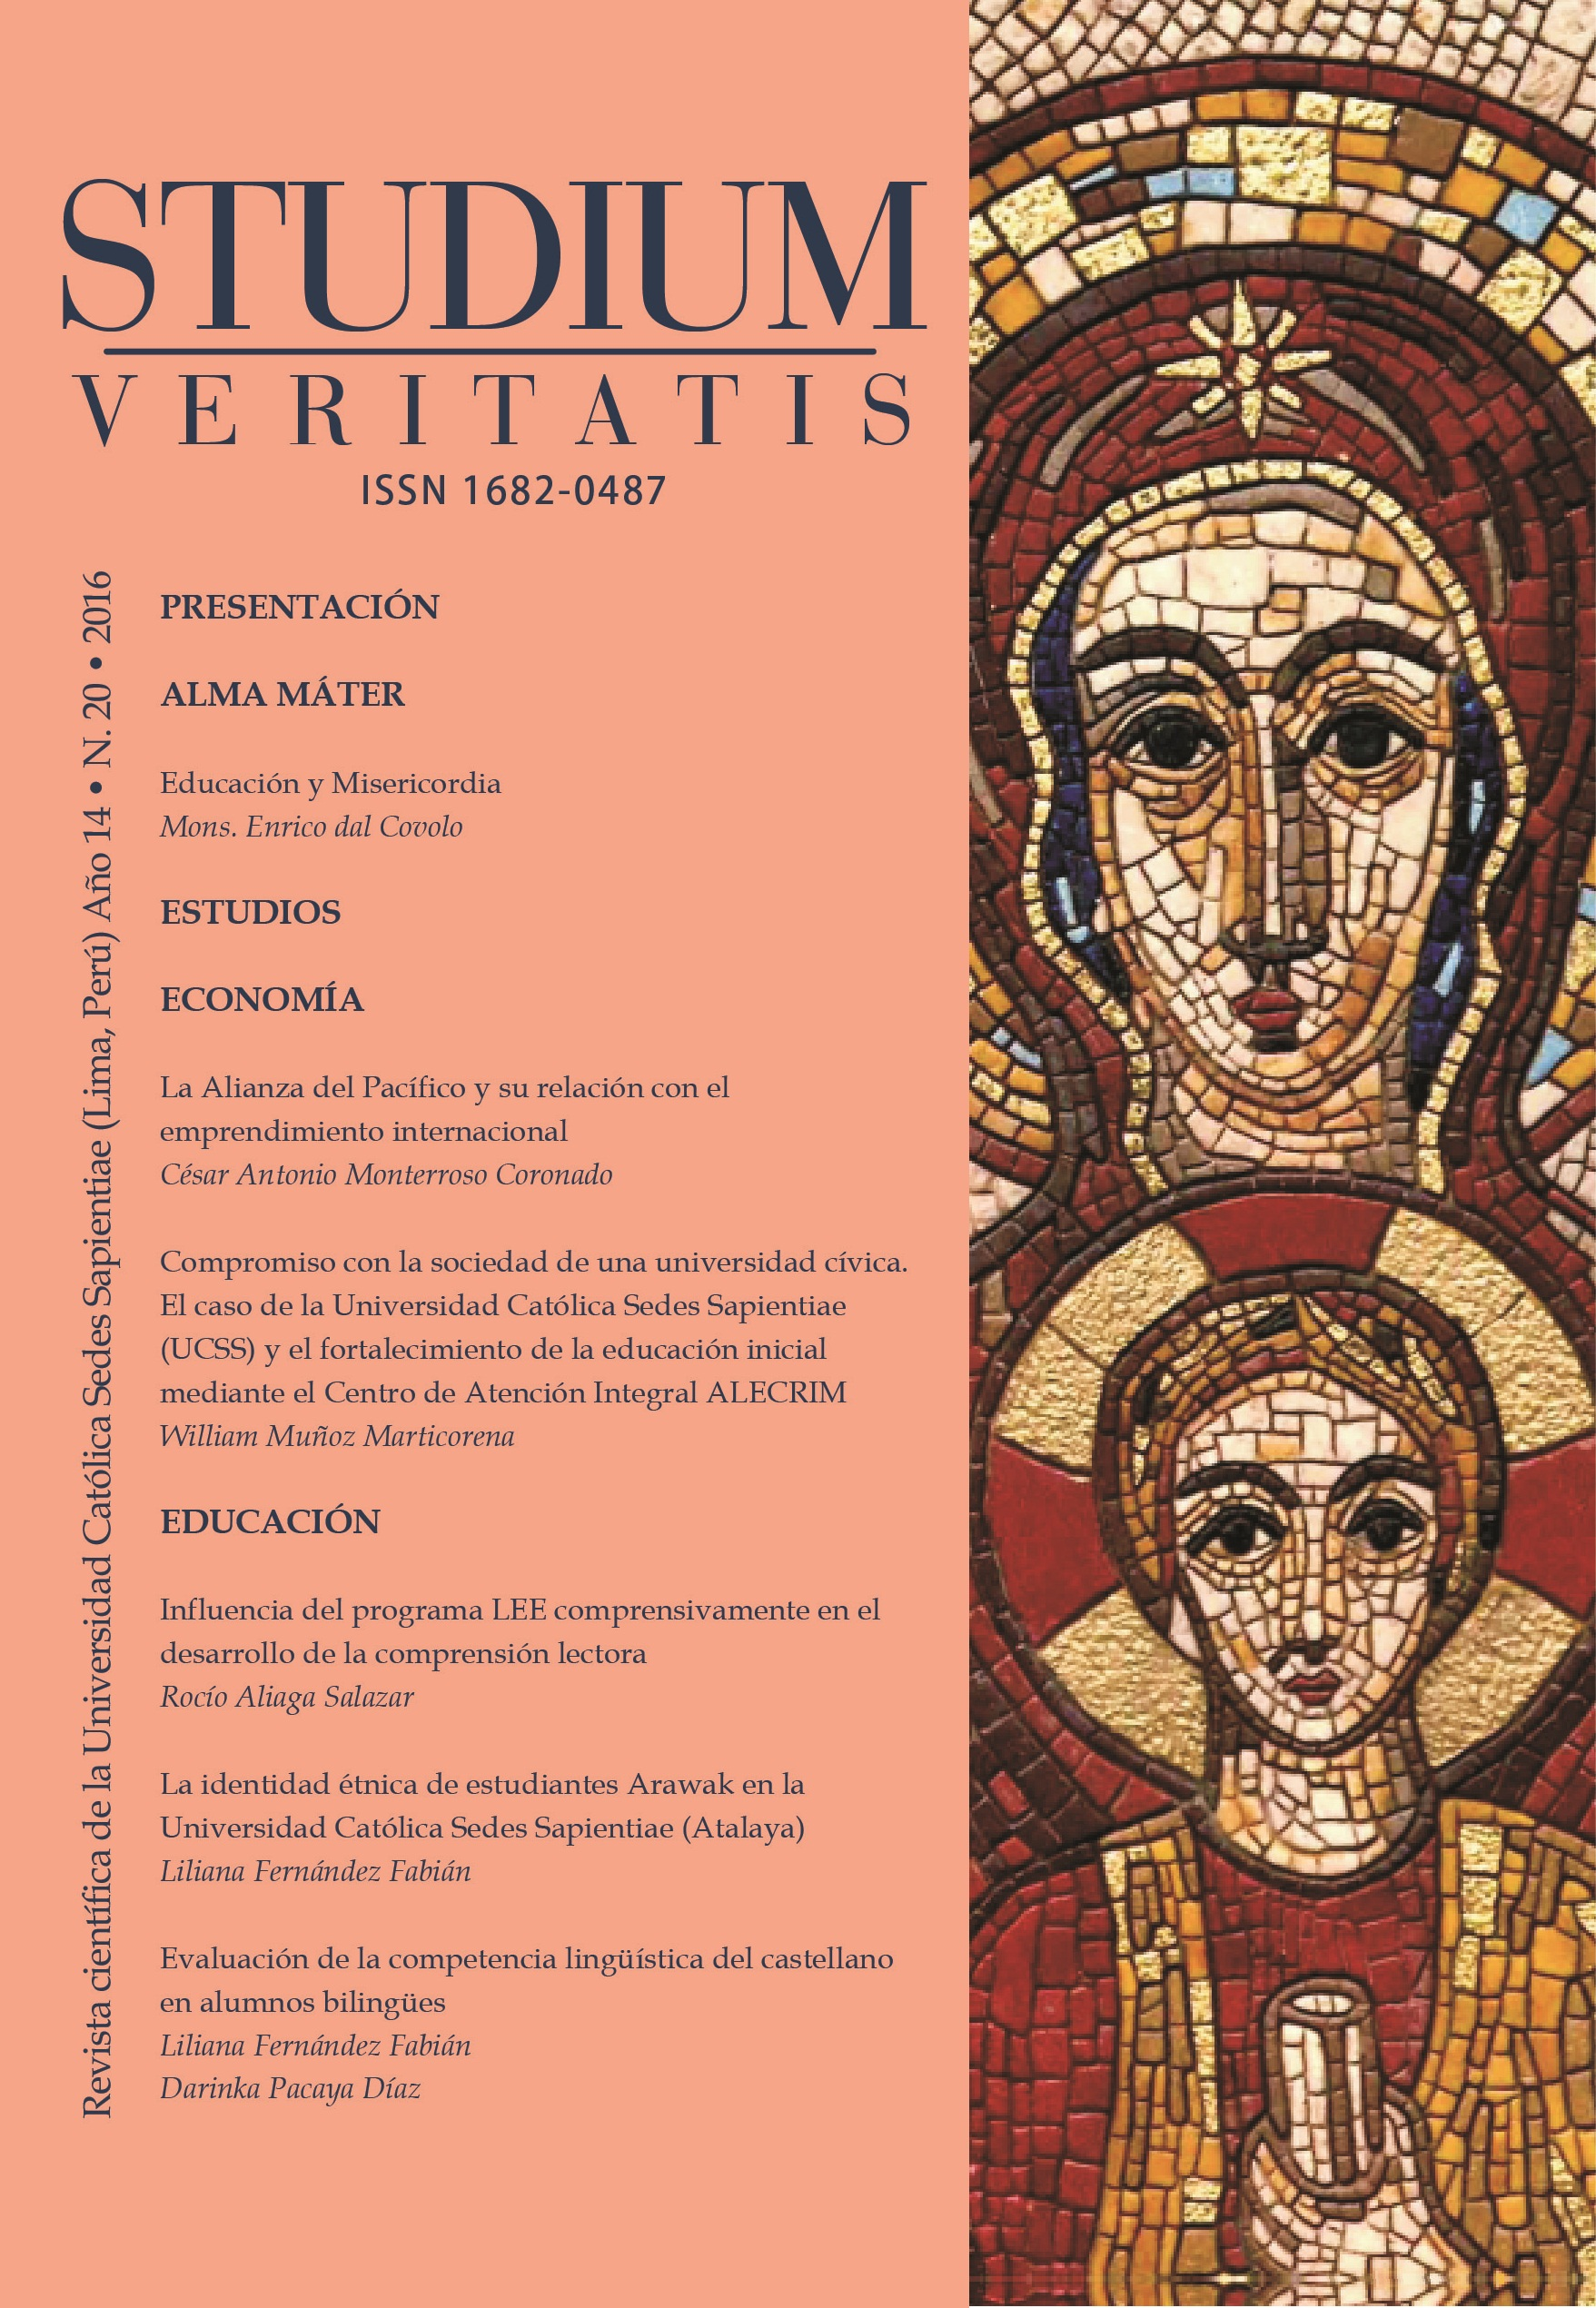 Ver Vol. 14 Núm. 20 (2016): Studium Veritatis